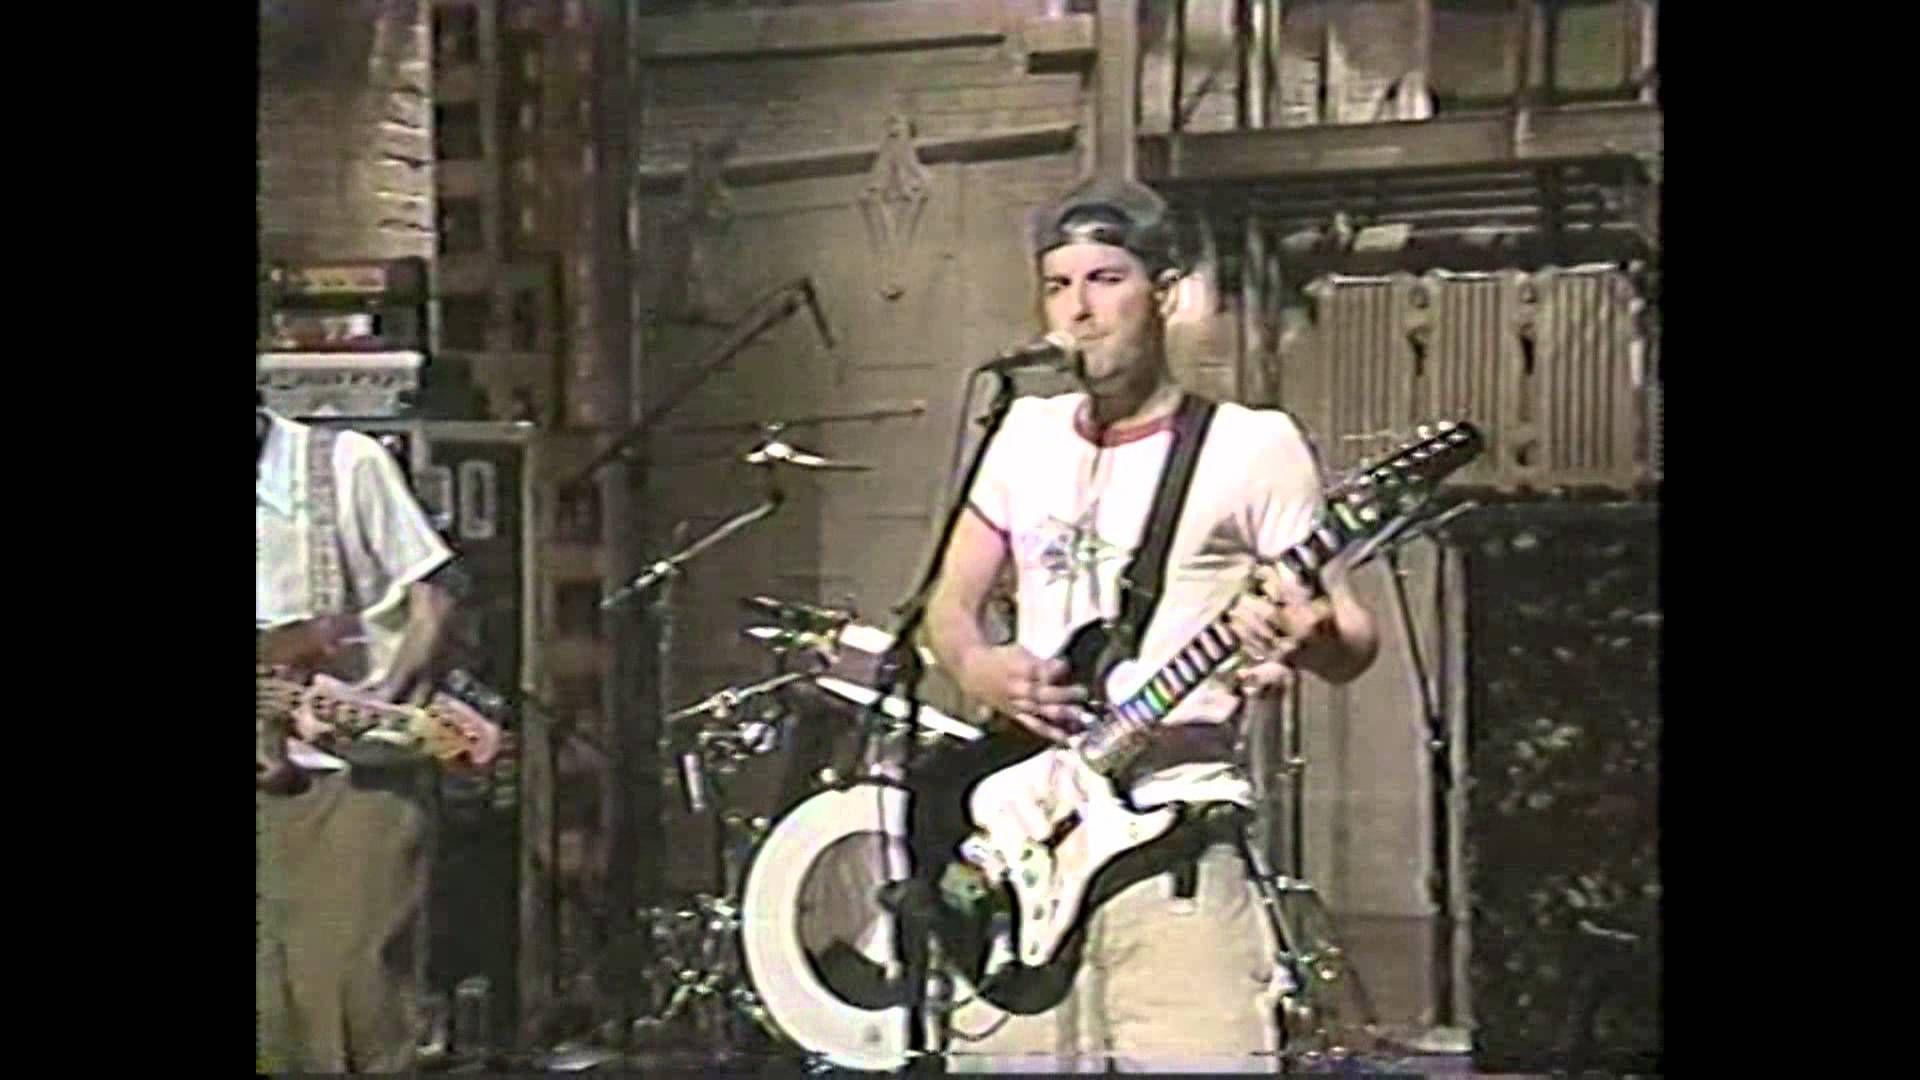 Beastie Boys - Sabotage ( David Letterman ) - 1994